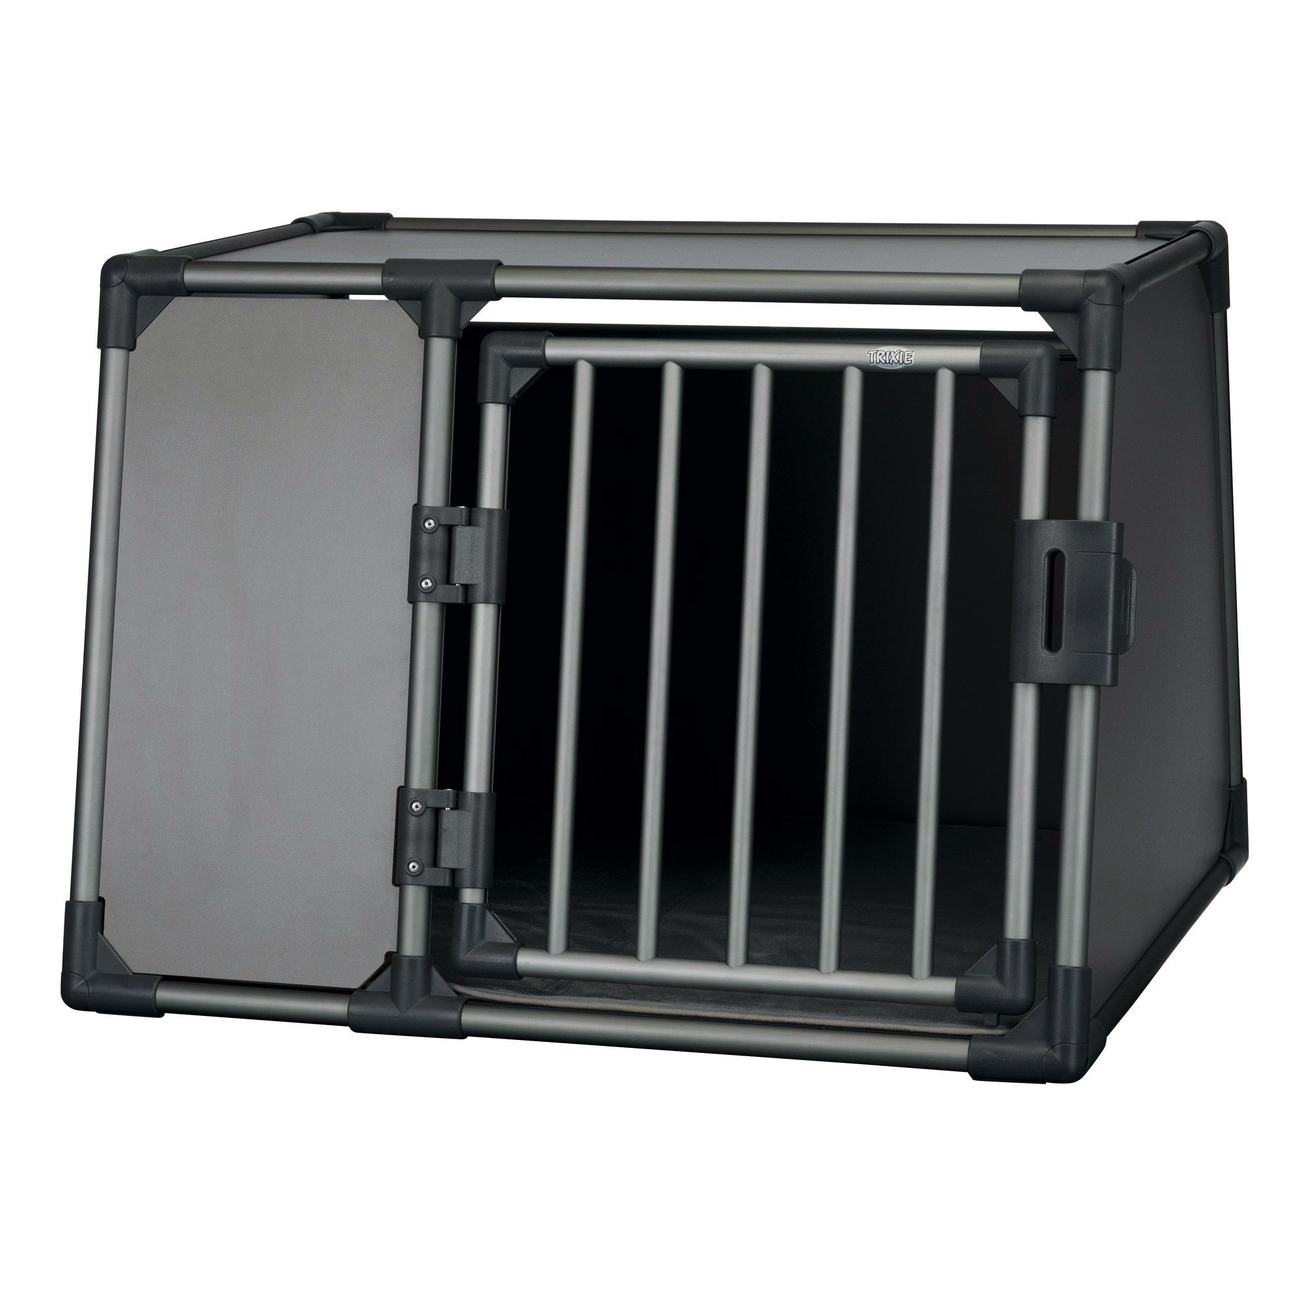 Trixie Autobox für Hunde aus Aluminium, graphit 39335, Bild 7